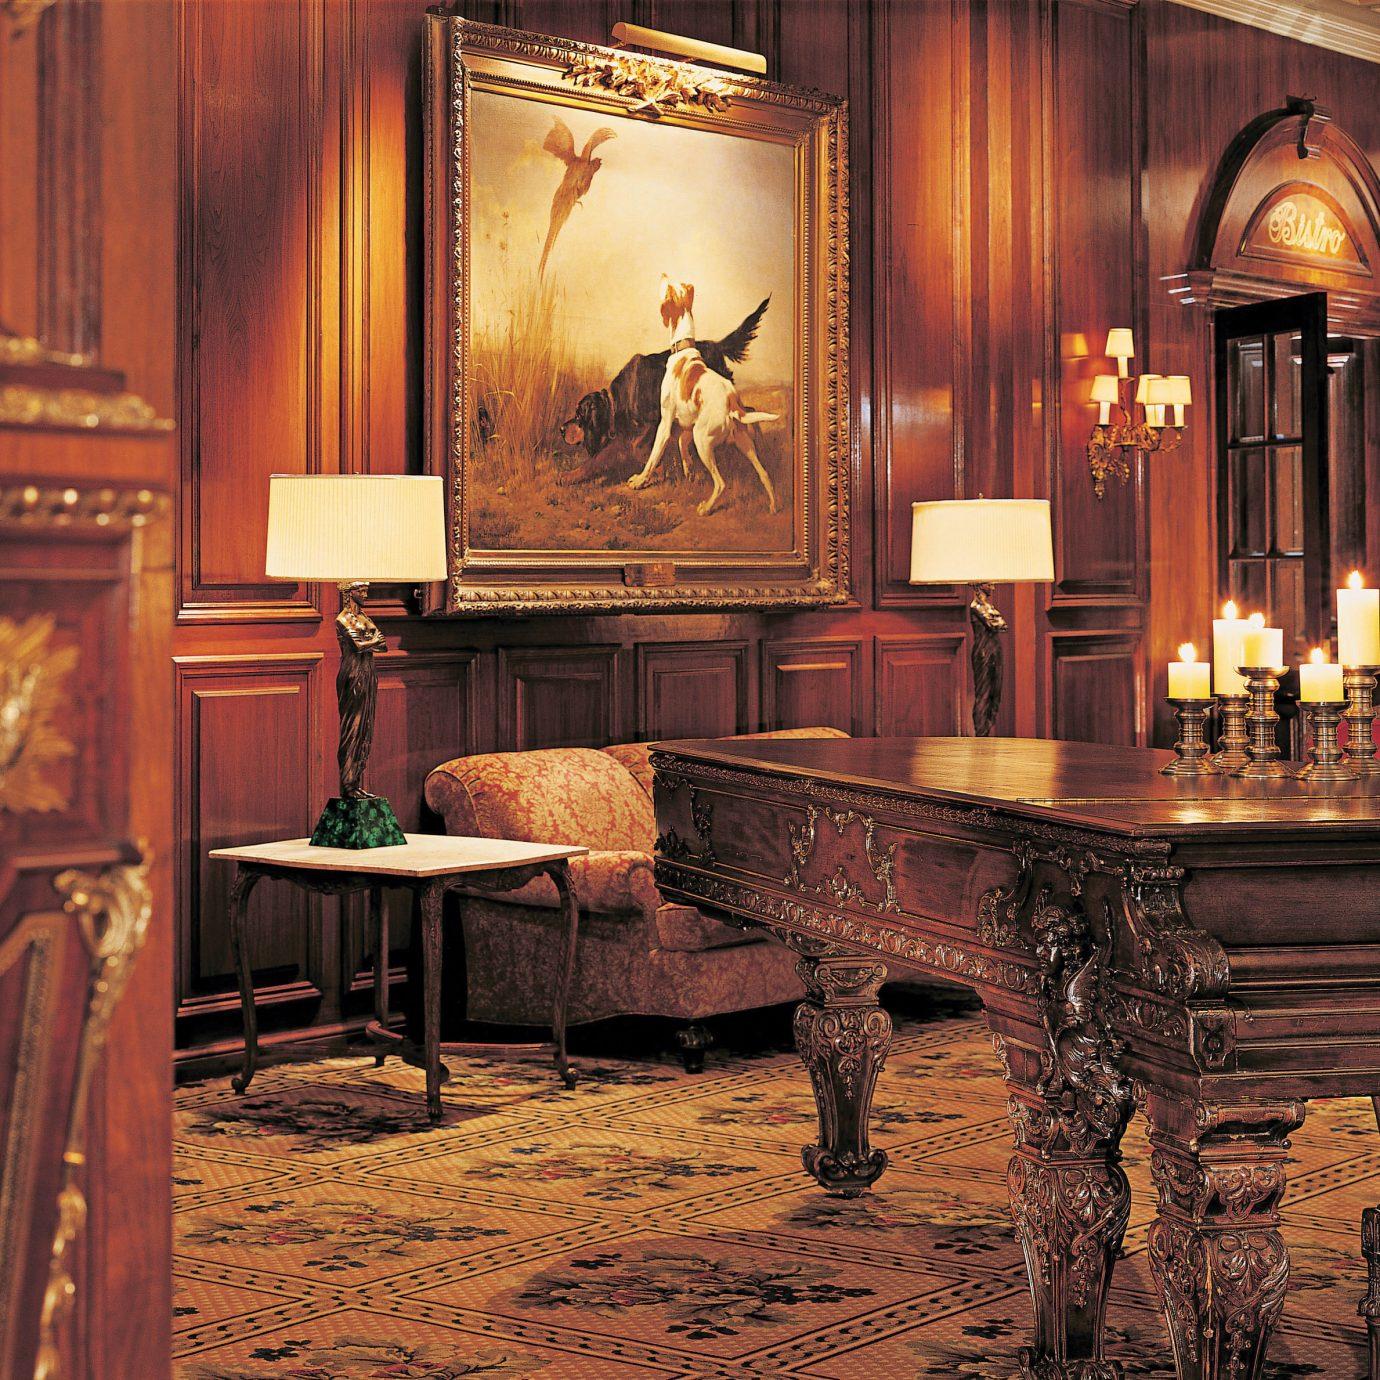 City Cultural Elegant Historic Lounge Lobby lighting mansion screenshot Bar restaurant fancy altar